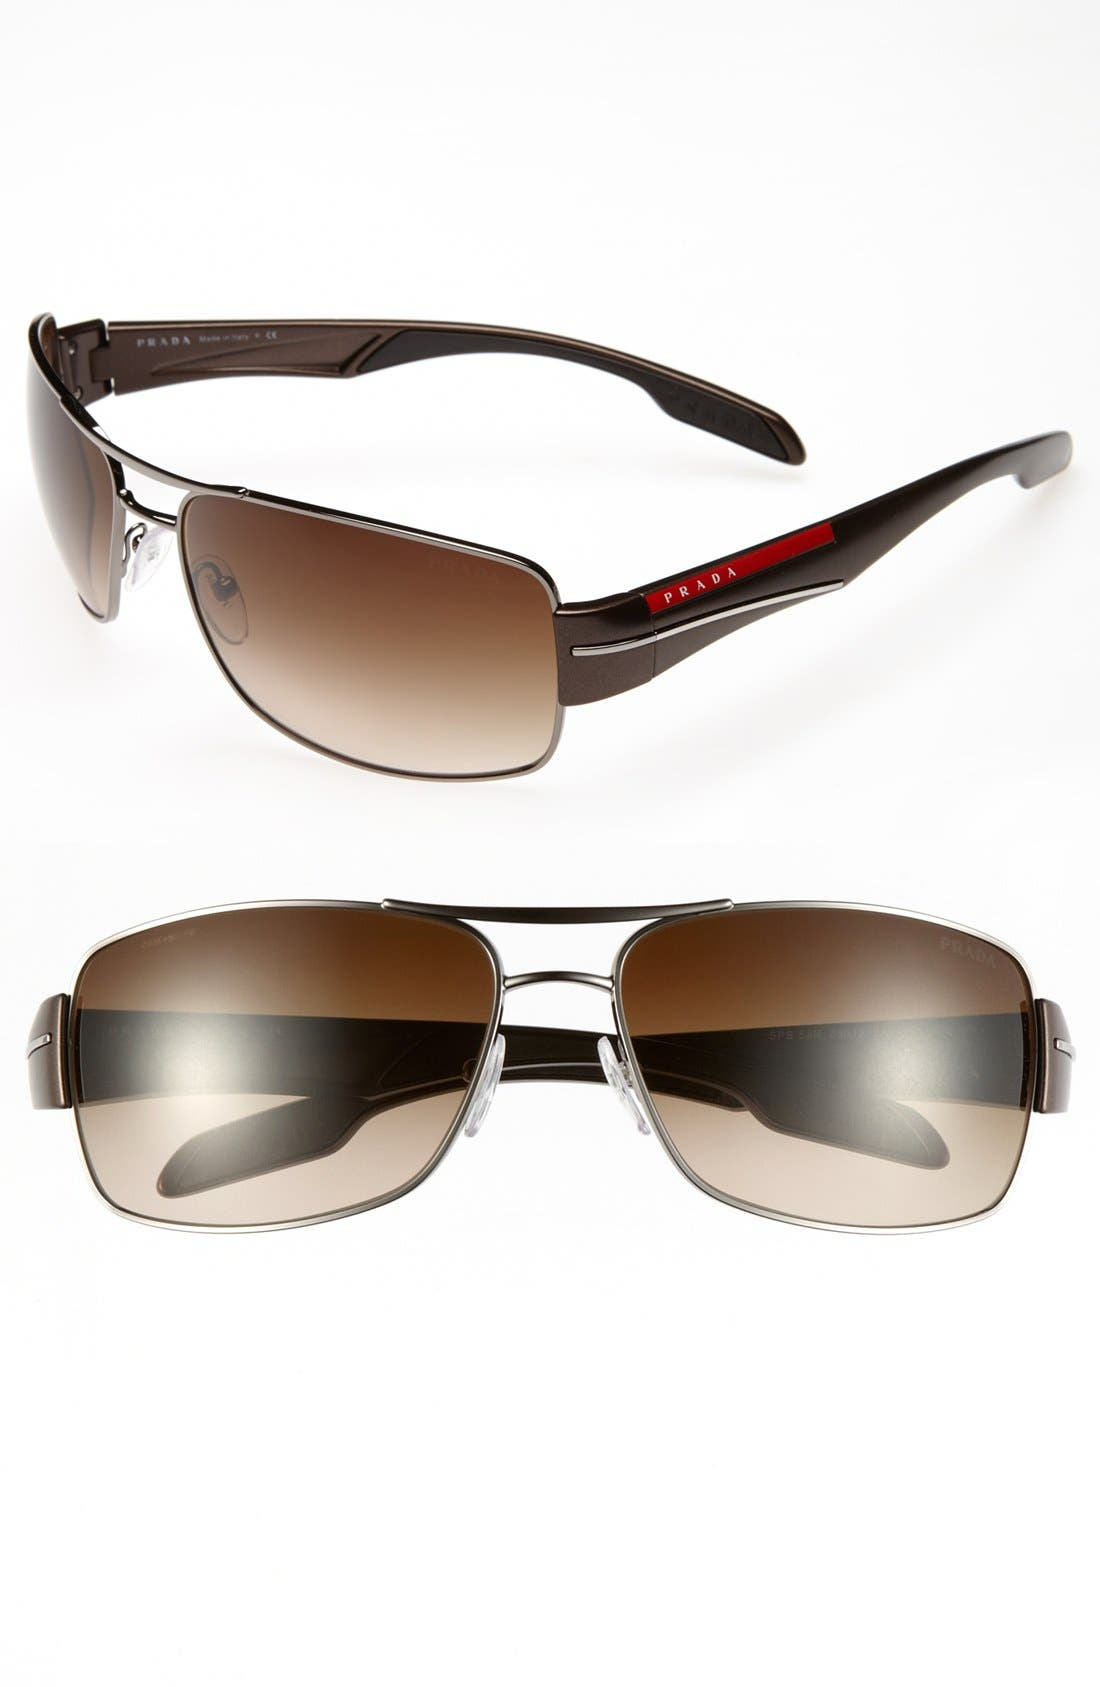 Alternate Image 1 Selected - Prada 65mm Aviator Sunglasses